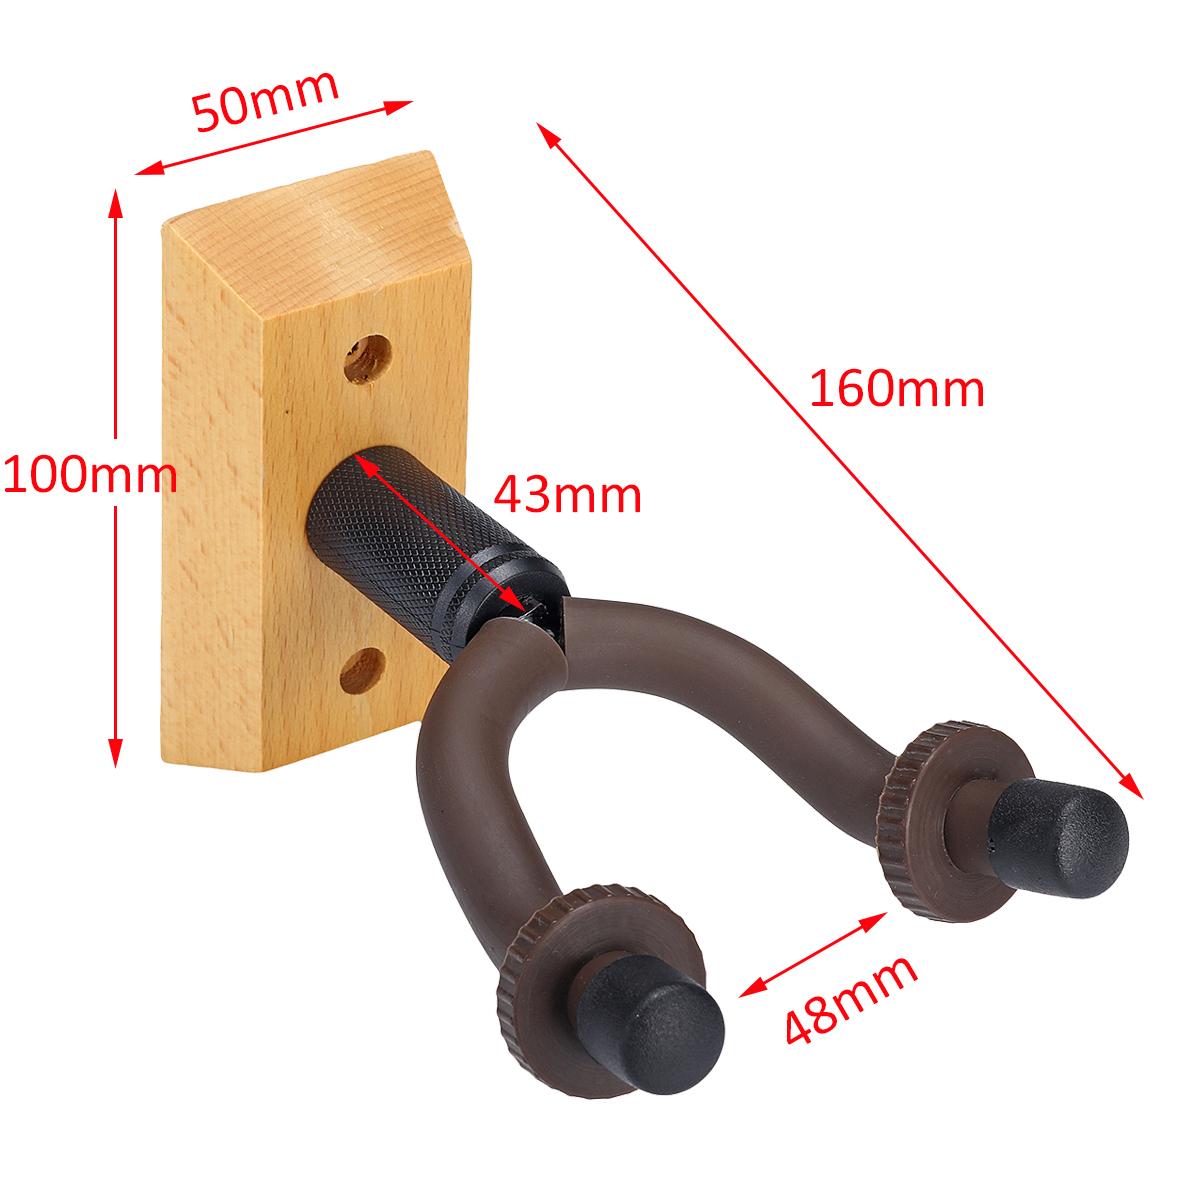 2PC Solid Wood Guitar Hook Ukulele Violin Wall Mount Hanger Bracket Multi-Angle Rotating Hook